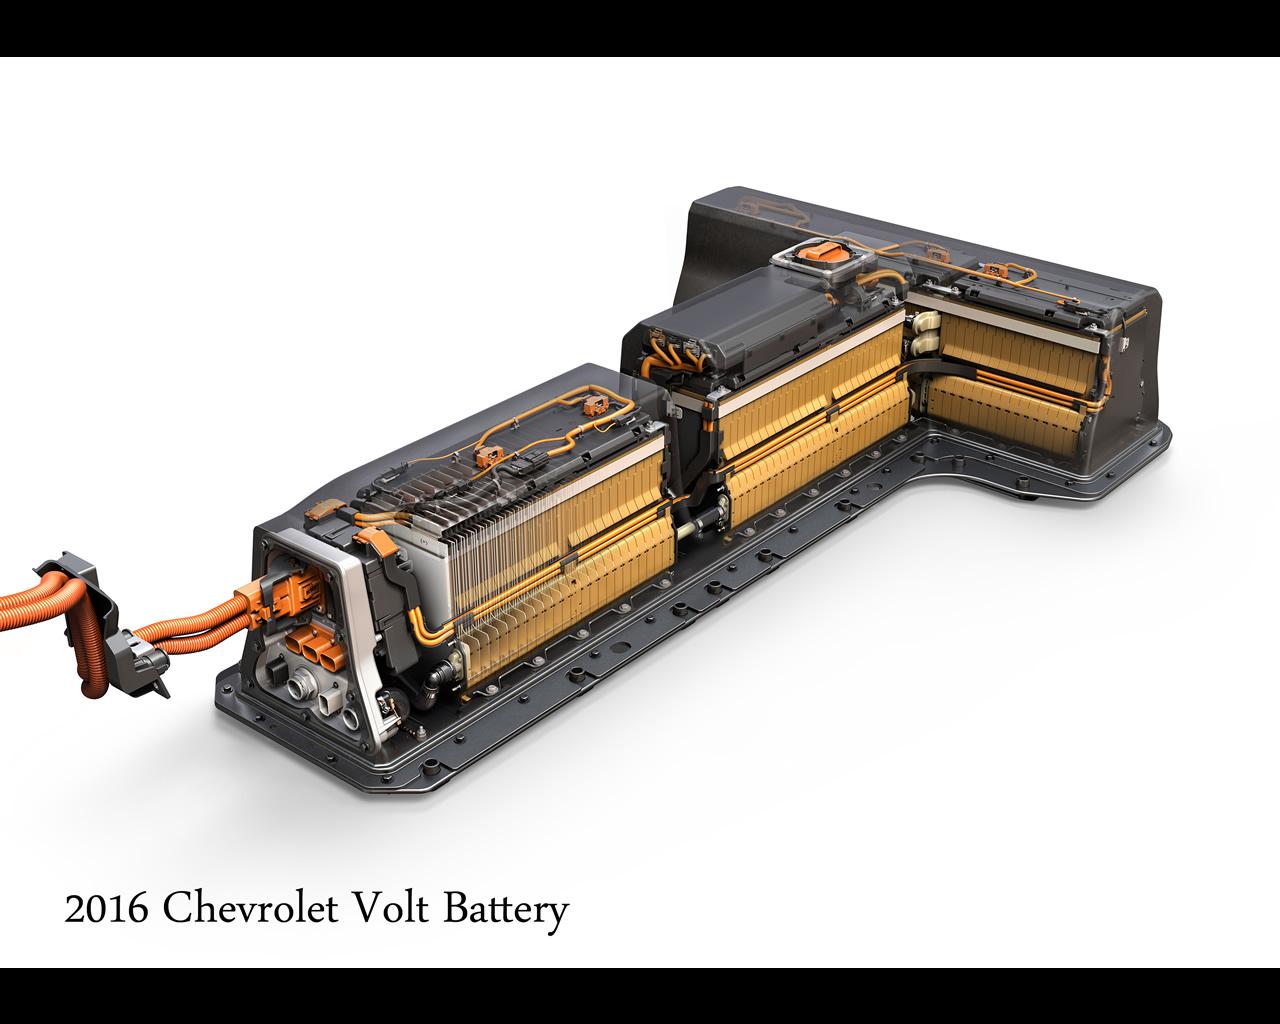 Chevrolet Electric Volt With Range Extender 2016